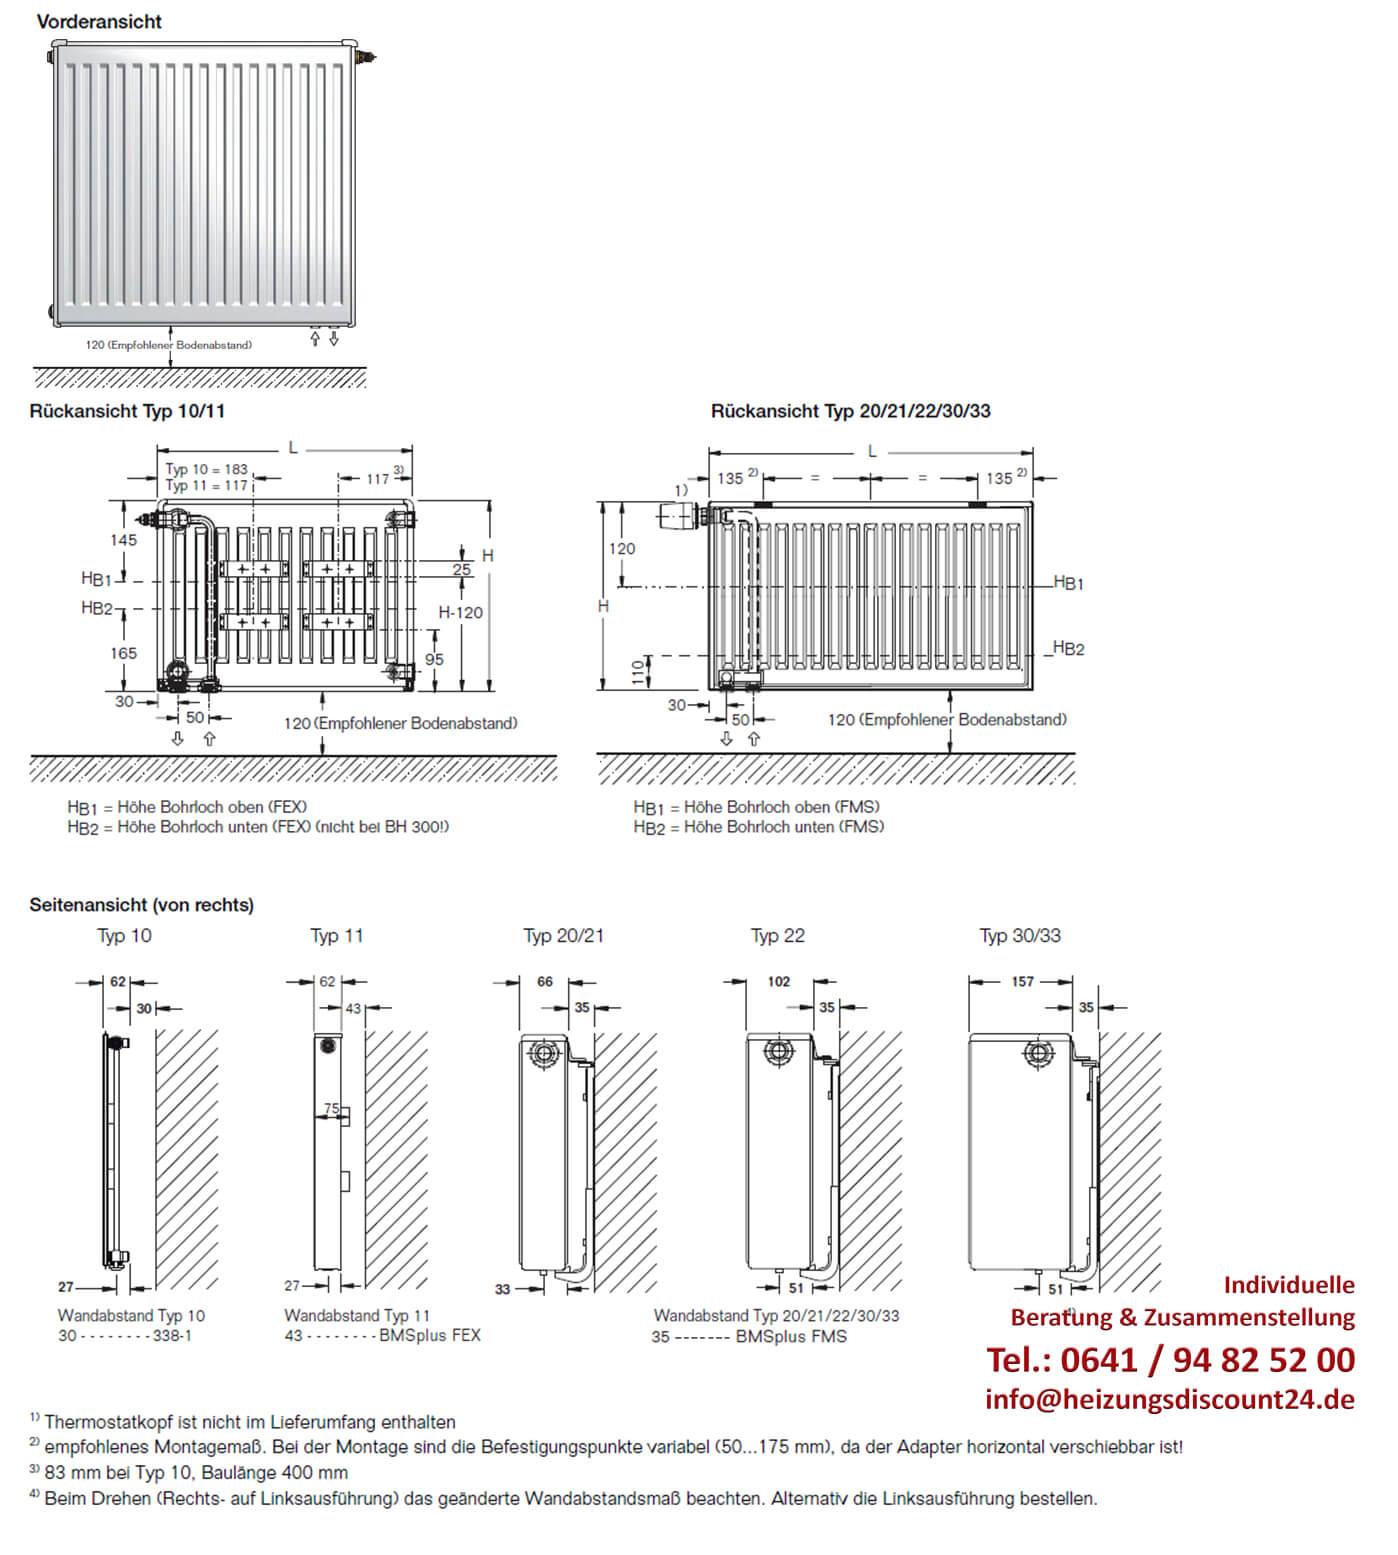 Buderus Ventil Kompakt Heizk/örper Profil VC-Profil Typ 22 H/öhe 400 mm L/änge 1200 mm mit Wandhalterung